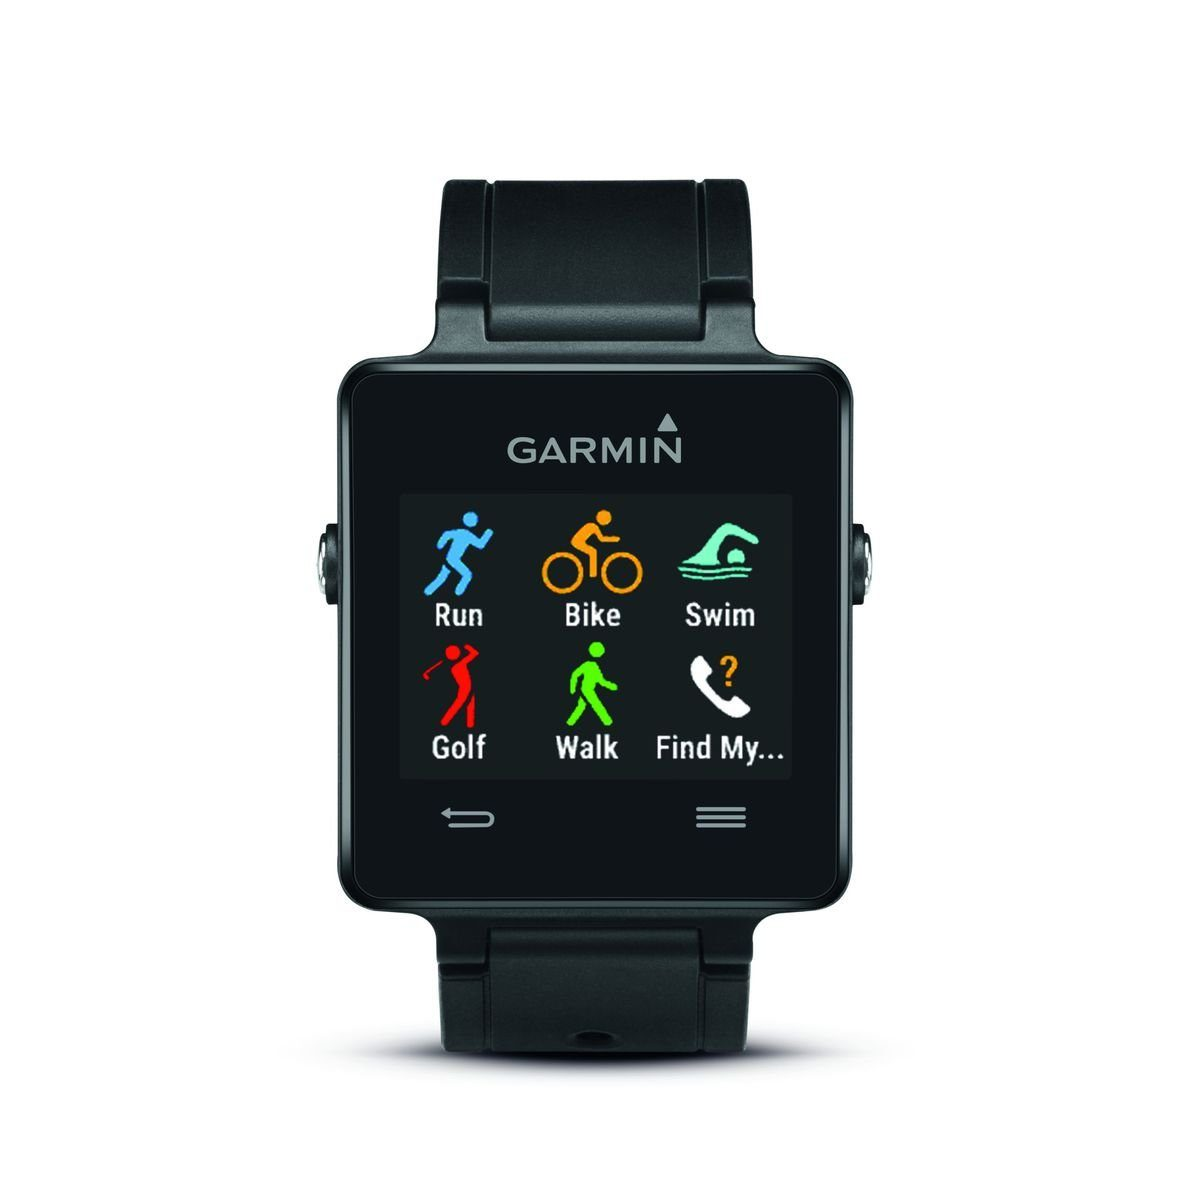 Garmin GPS-Smartwatch »vivoactive«